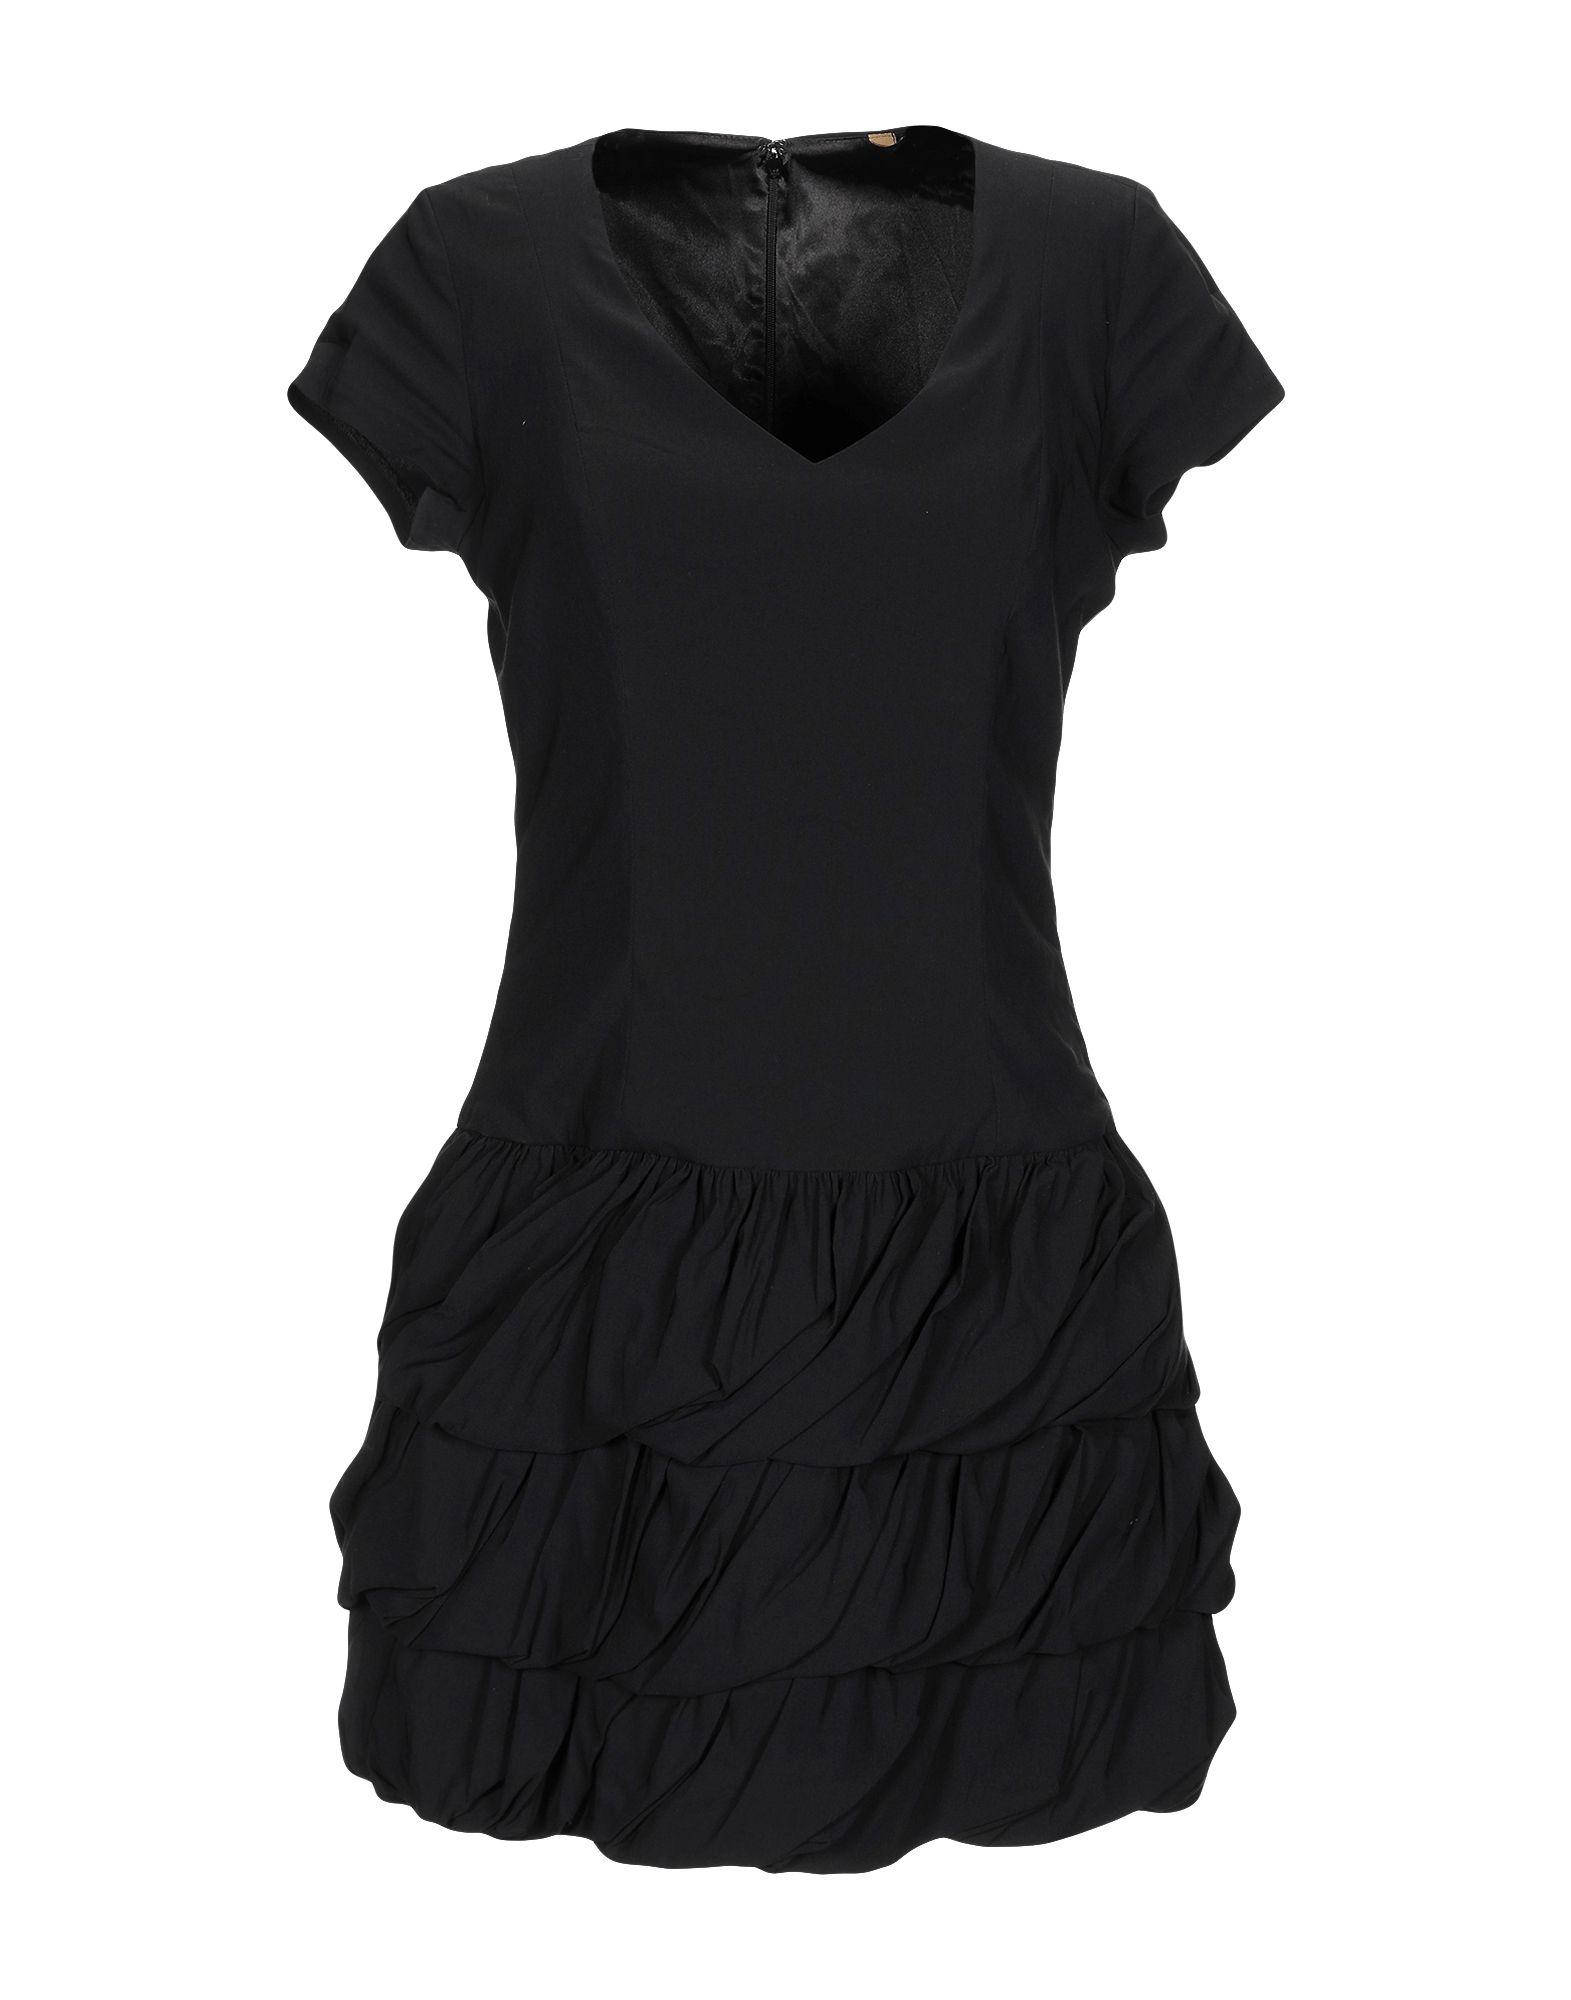 Фото - KOVA&T Короткое платье t skirt зеленое короткое платье